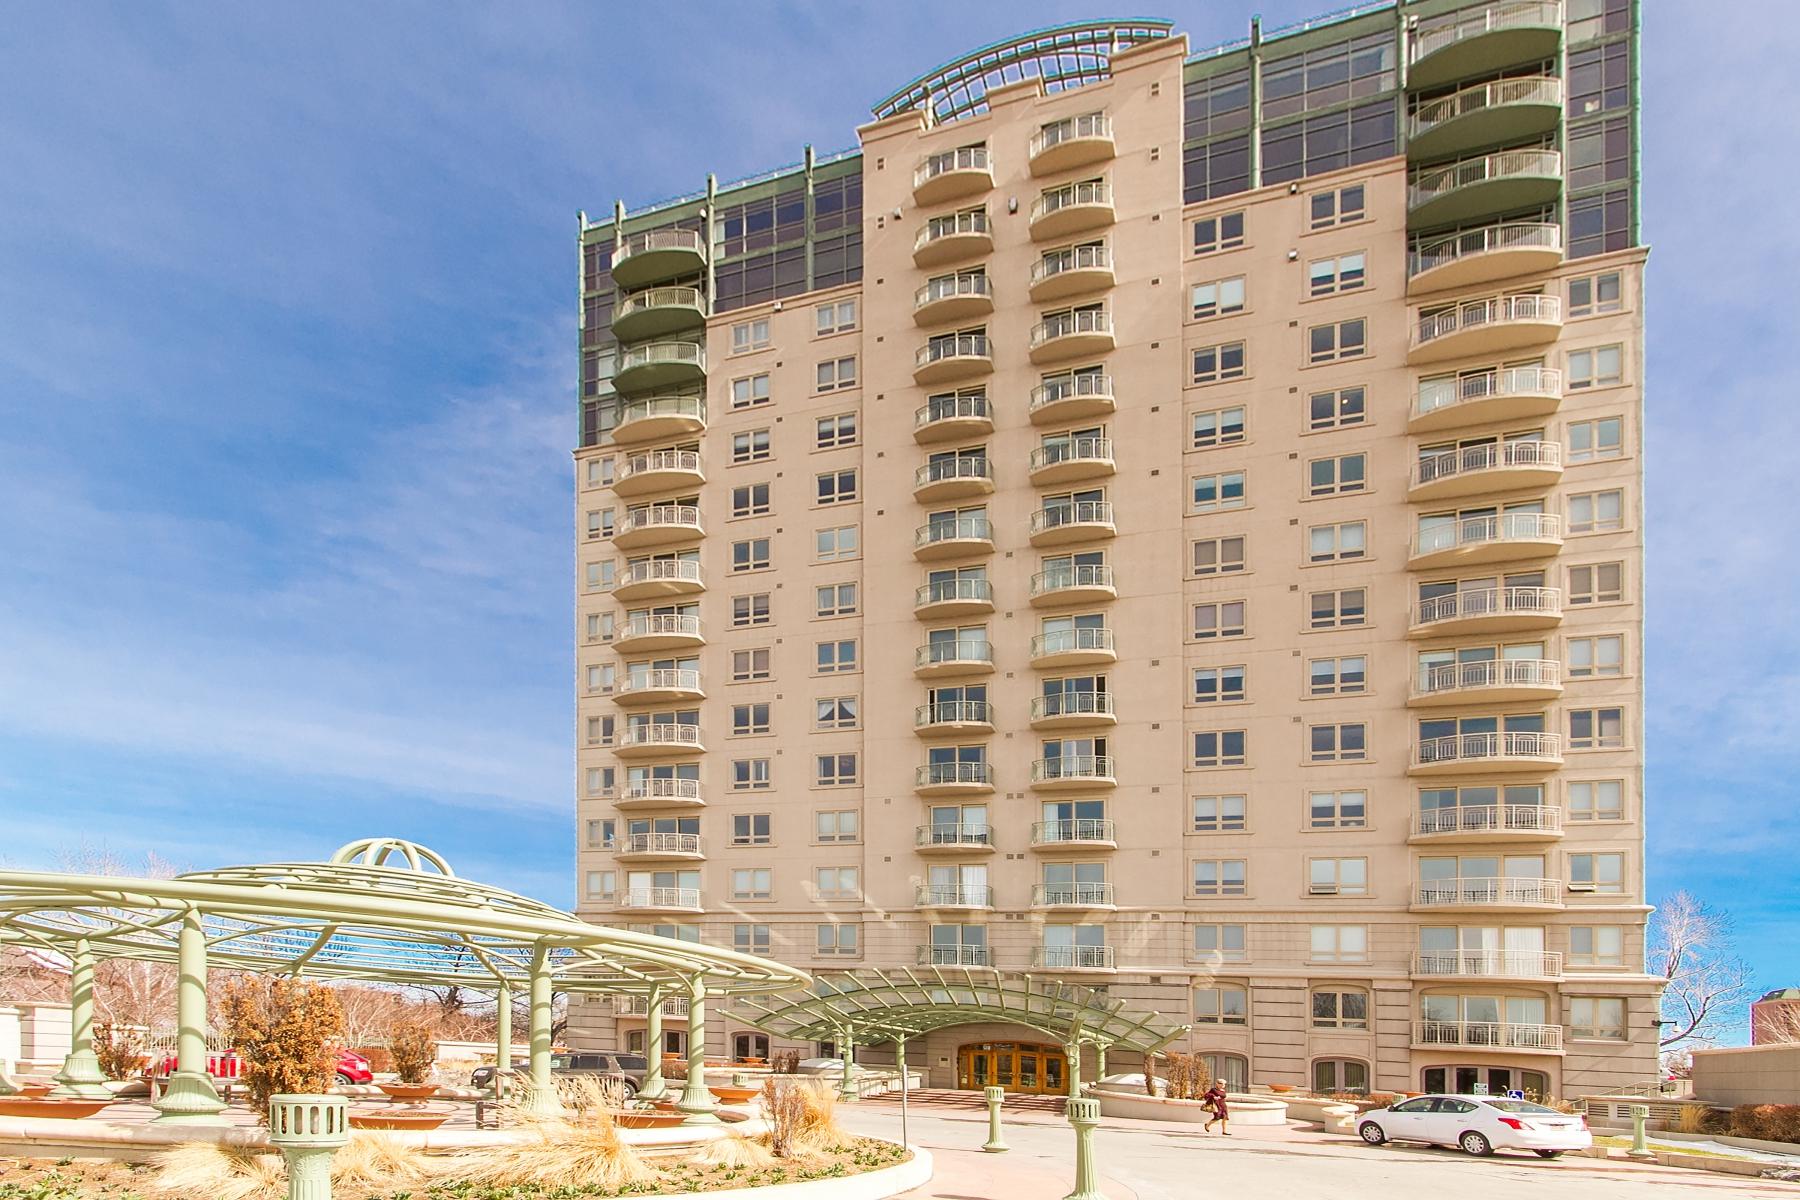 Condominium for Sale at 400 E 3rd Avenue Unit 903 400 East 3rd Avenue #903 Washington Park, Denver, Colorado 80203 United States